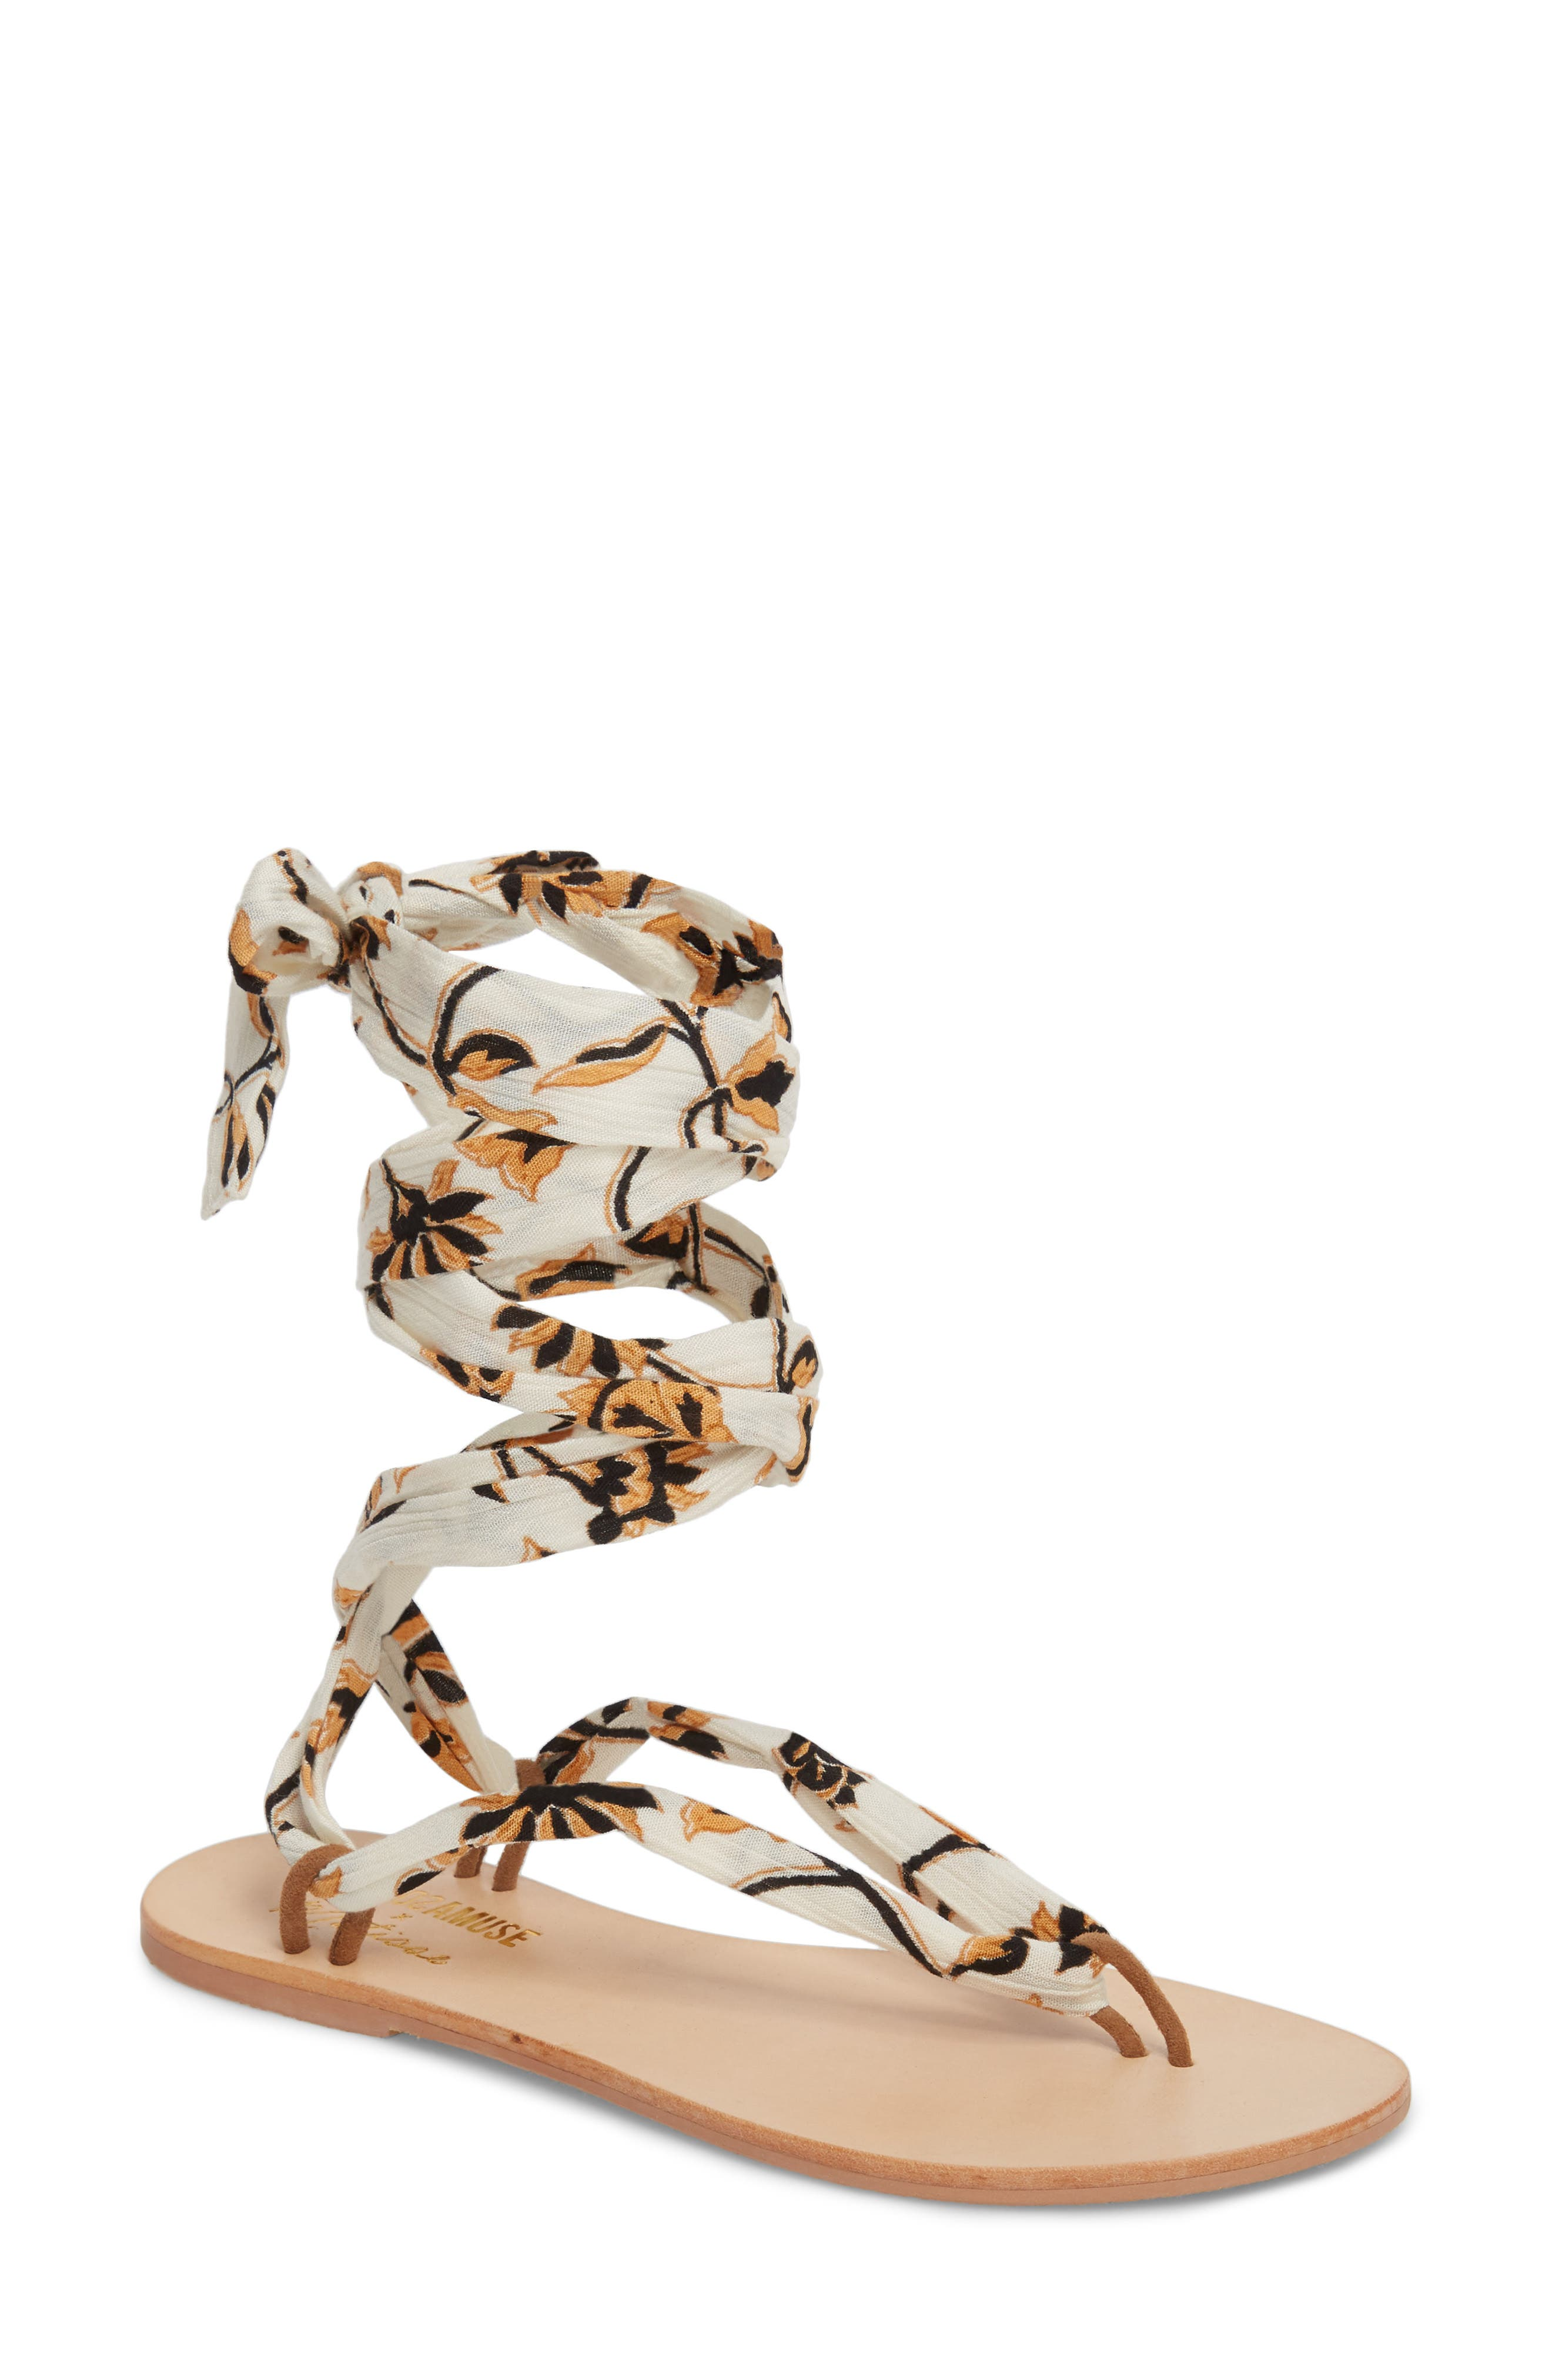 Amuse Society x Matisse Oceano Lace-Up Sandal,                             Main thumbnail 1, color,                             Natural Fabric